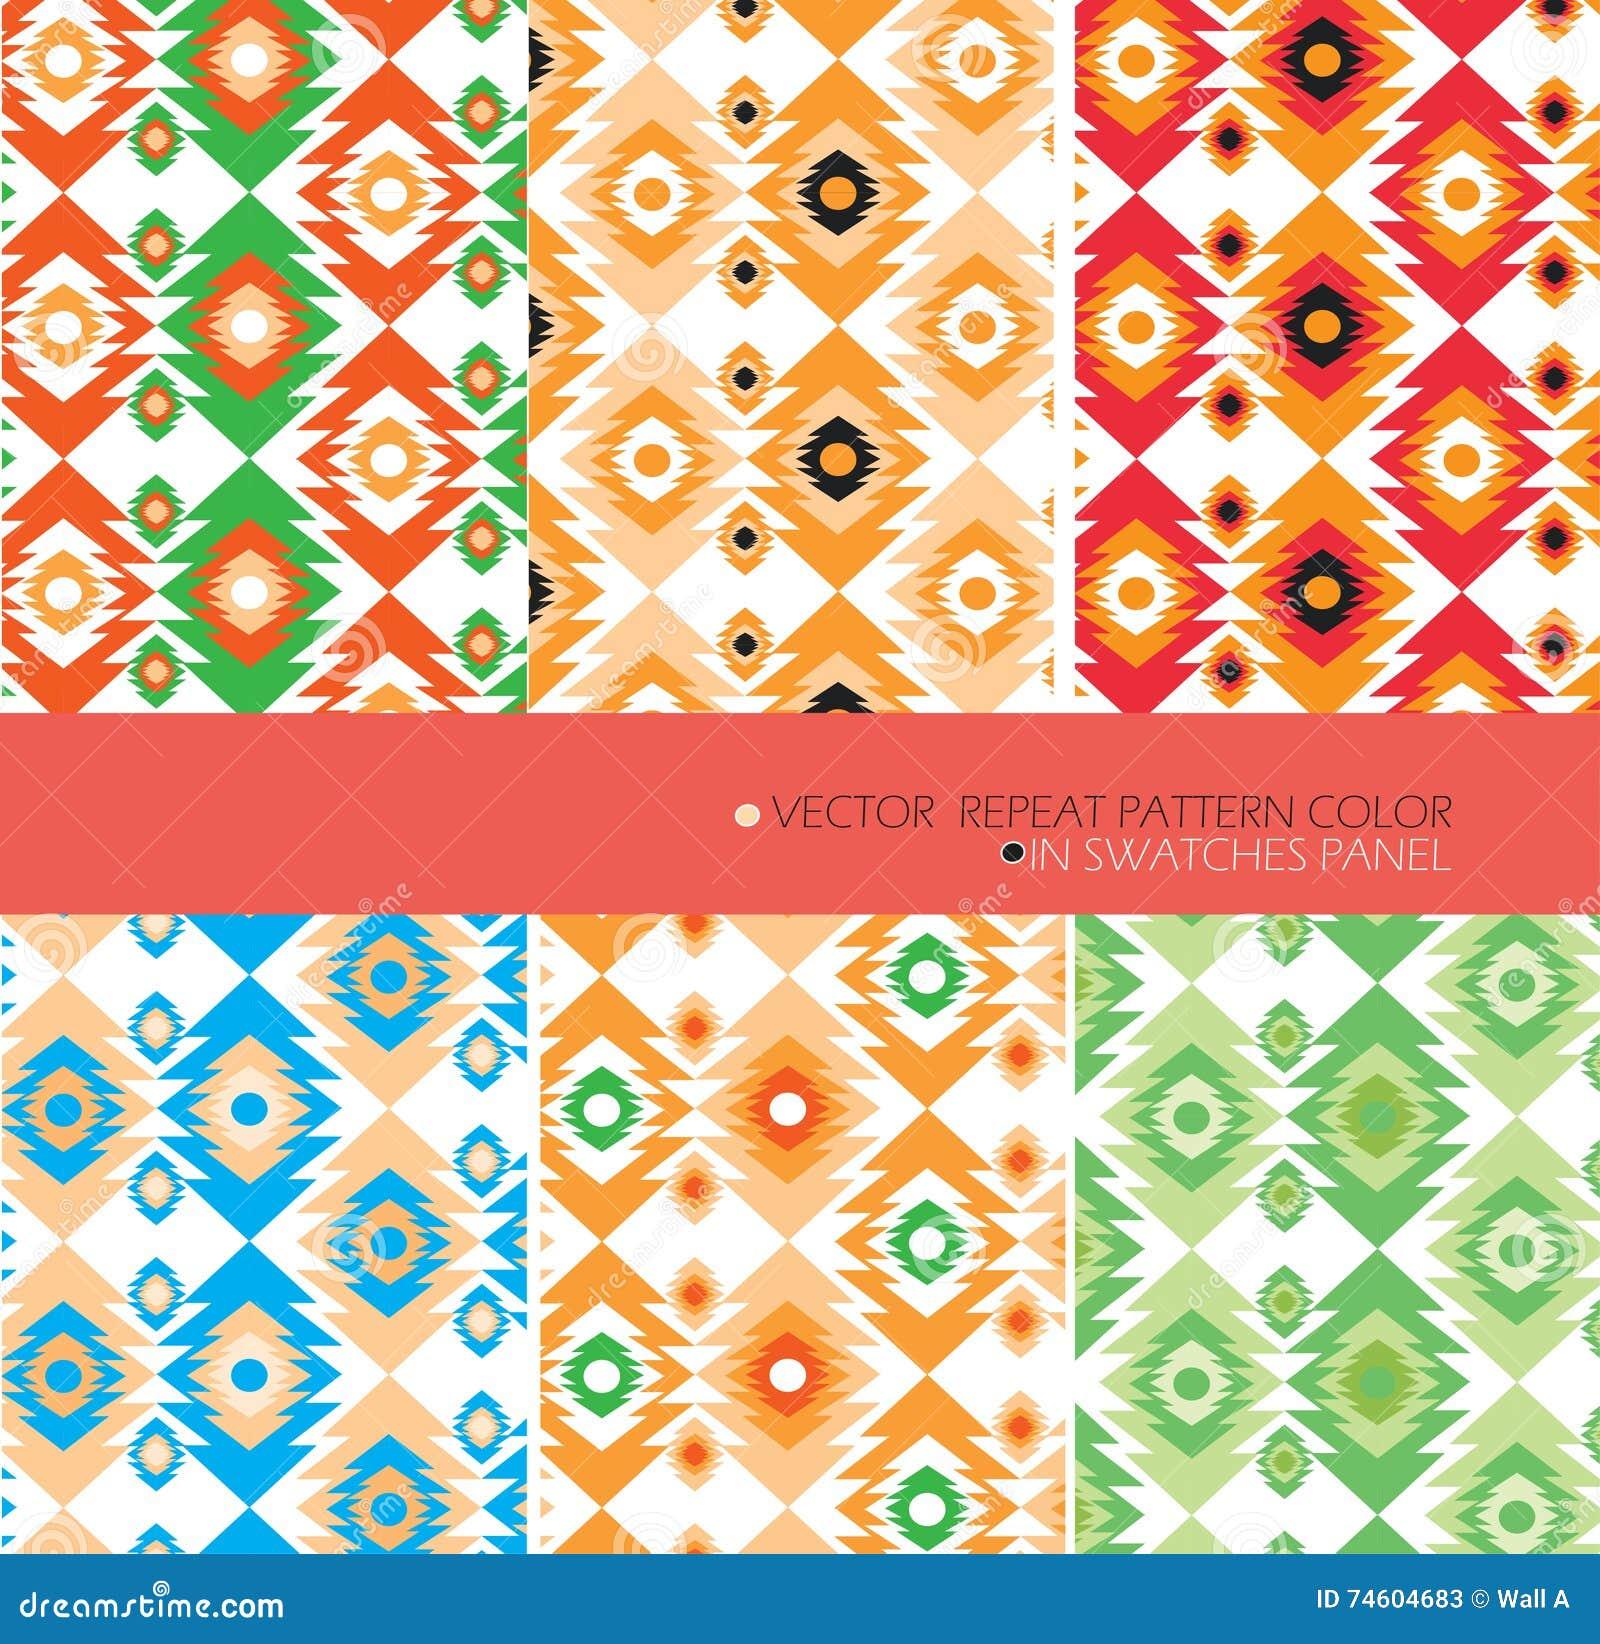 Repeat pattern modern graphic vector set 6 color aztec background stock illustration image - Ways decorating using kilim print ...